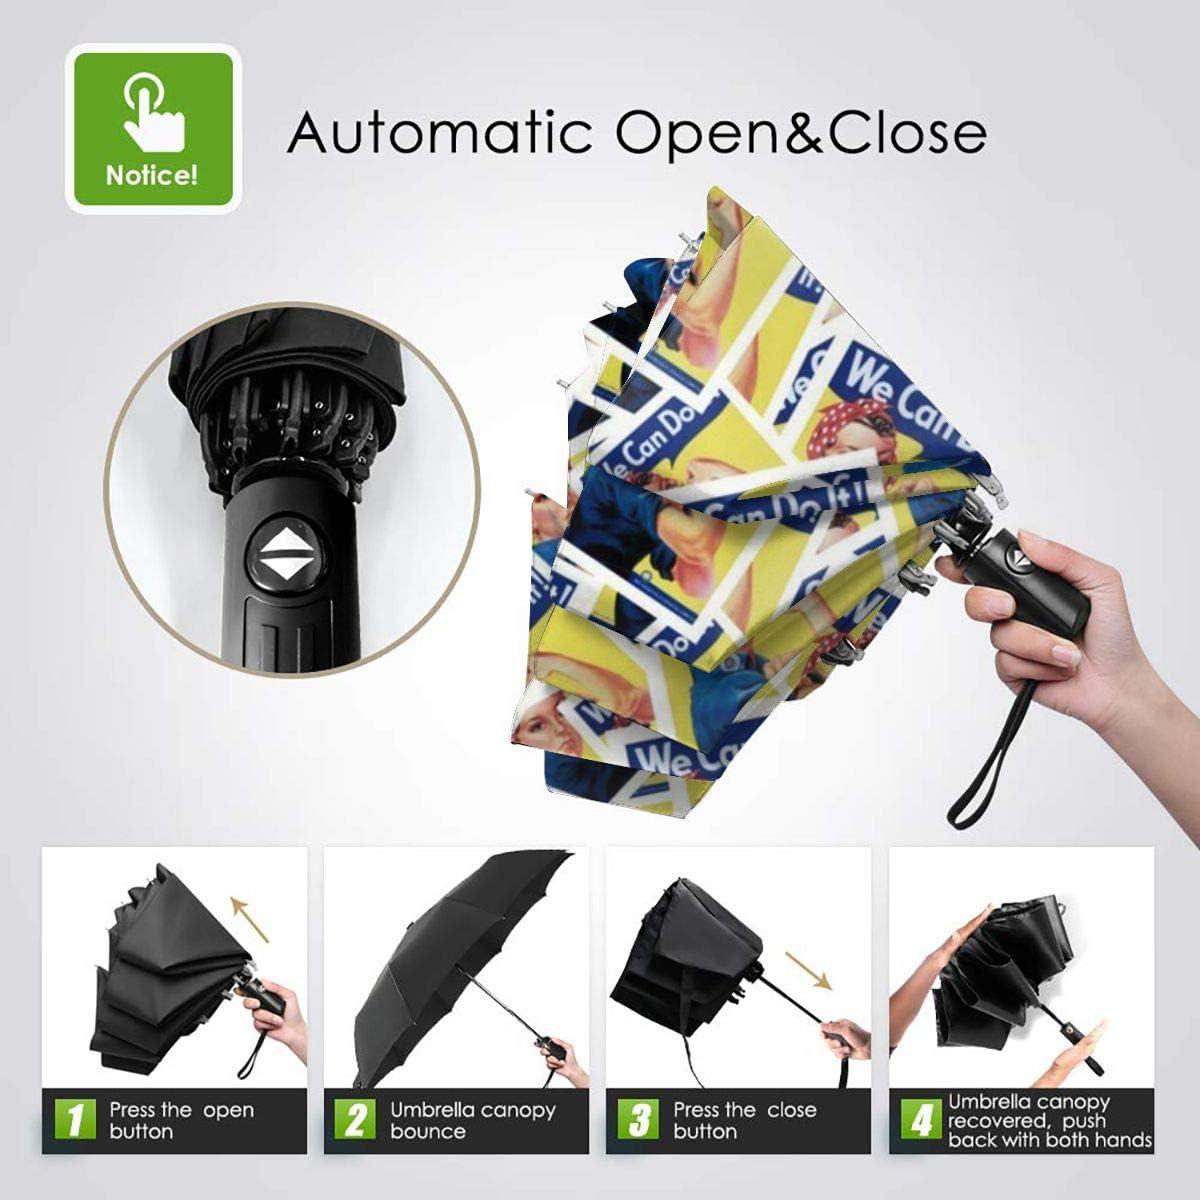 Auto Open//Close Compact Umbrella,Gold Wheels And Stripes Automatic Folding Travel Umbrella Ergonomic Non-Slip Handle